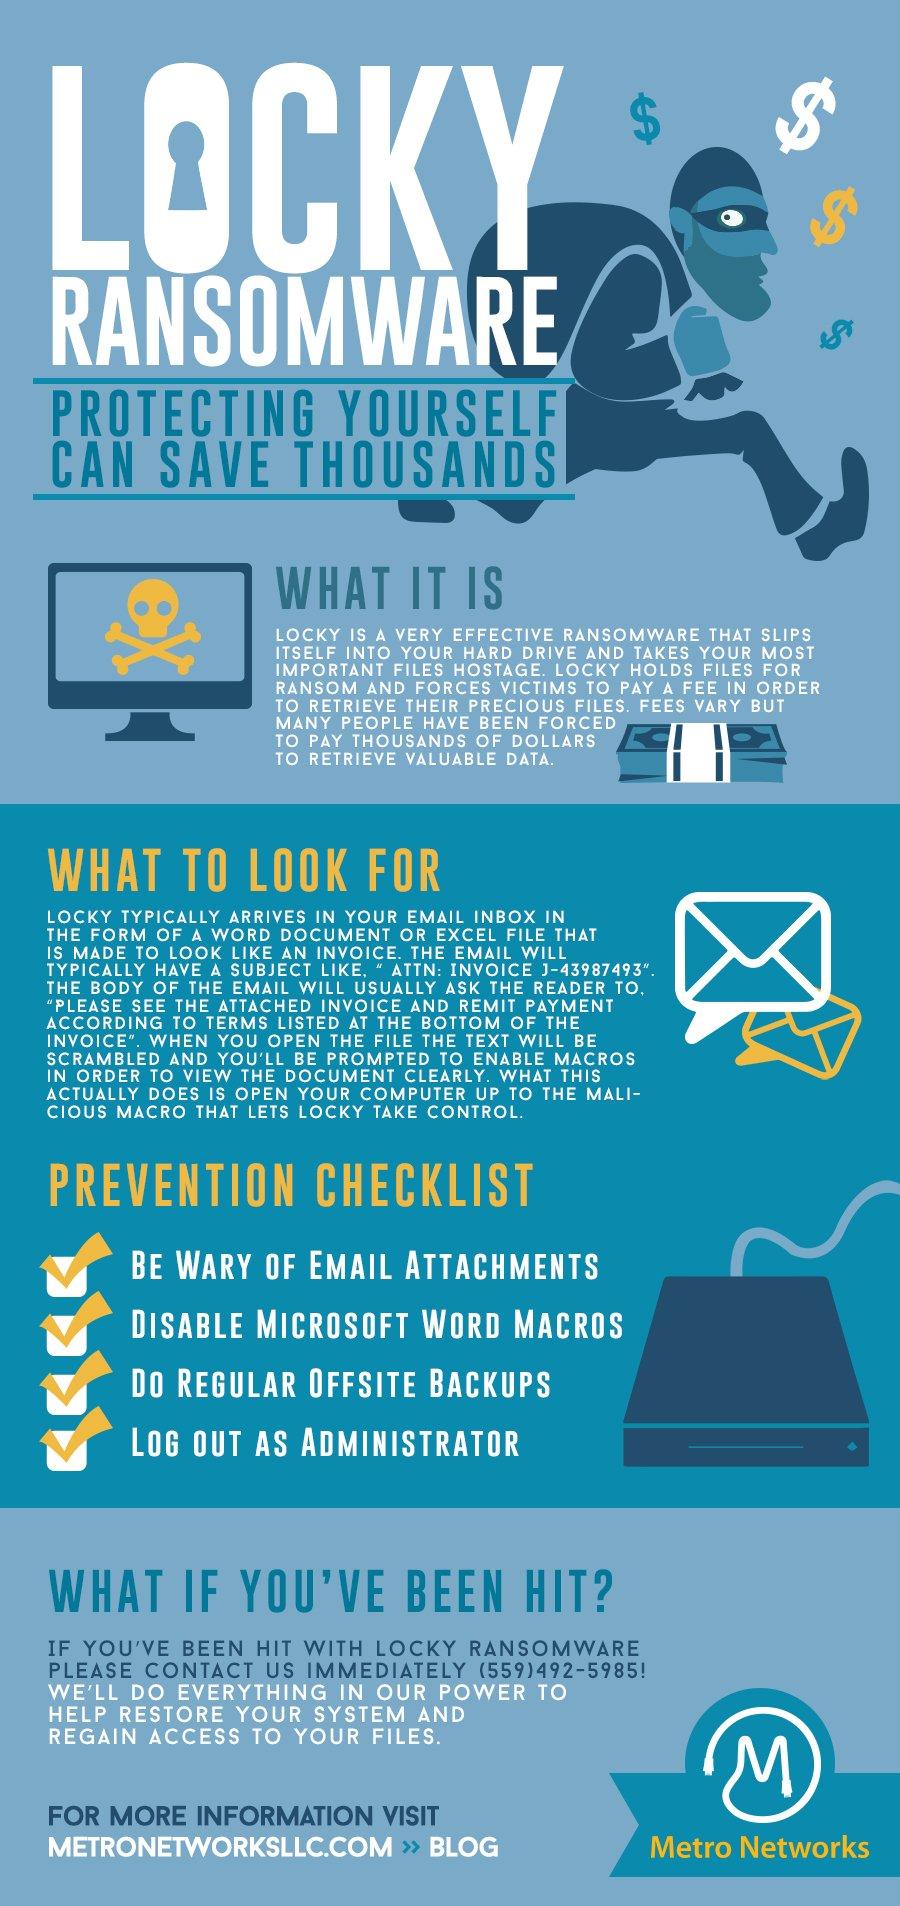 Locky ransomware web